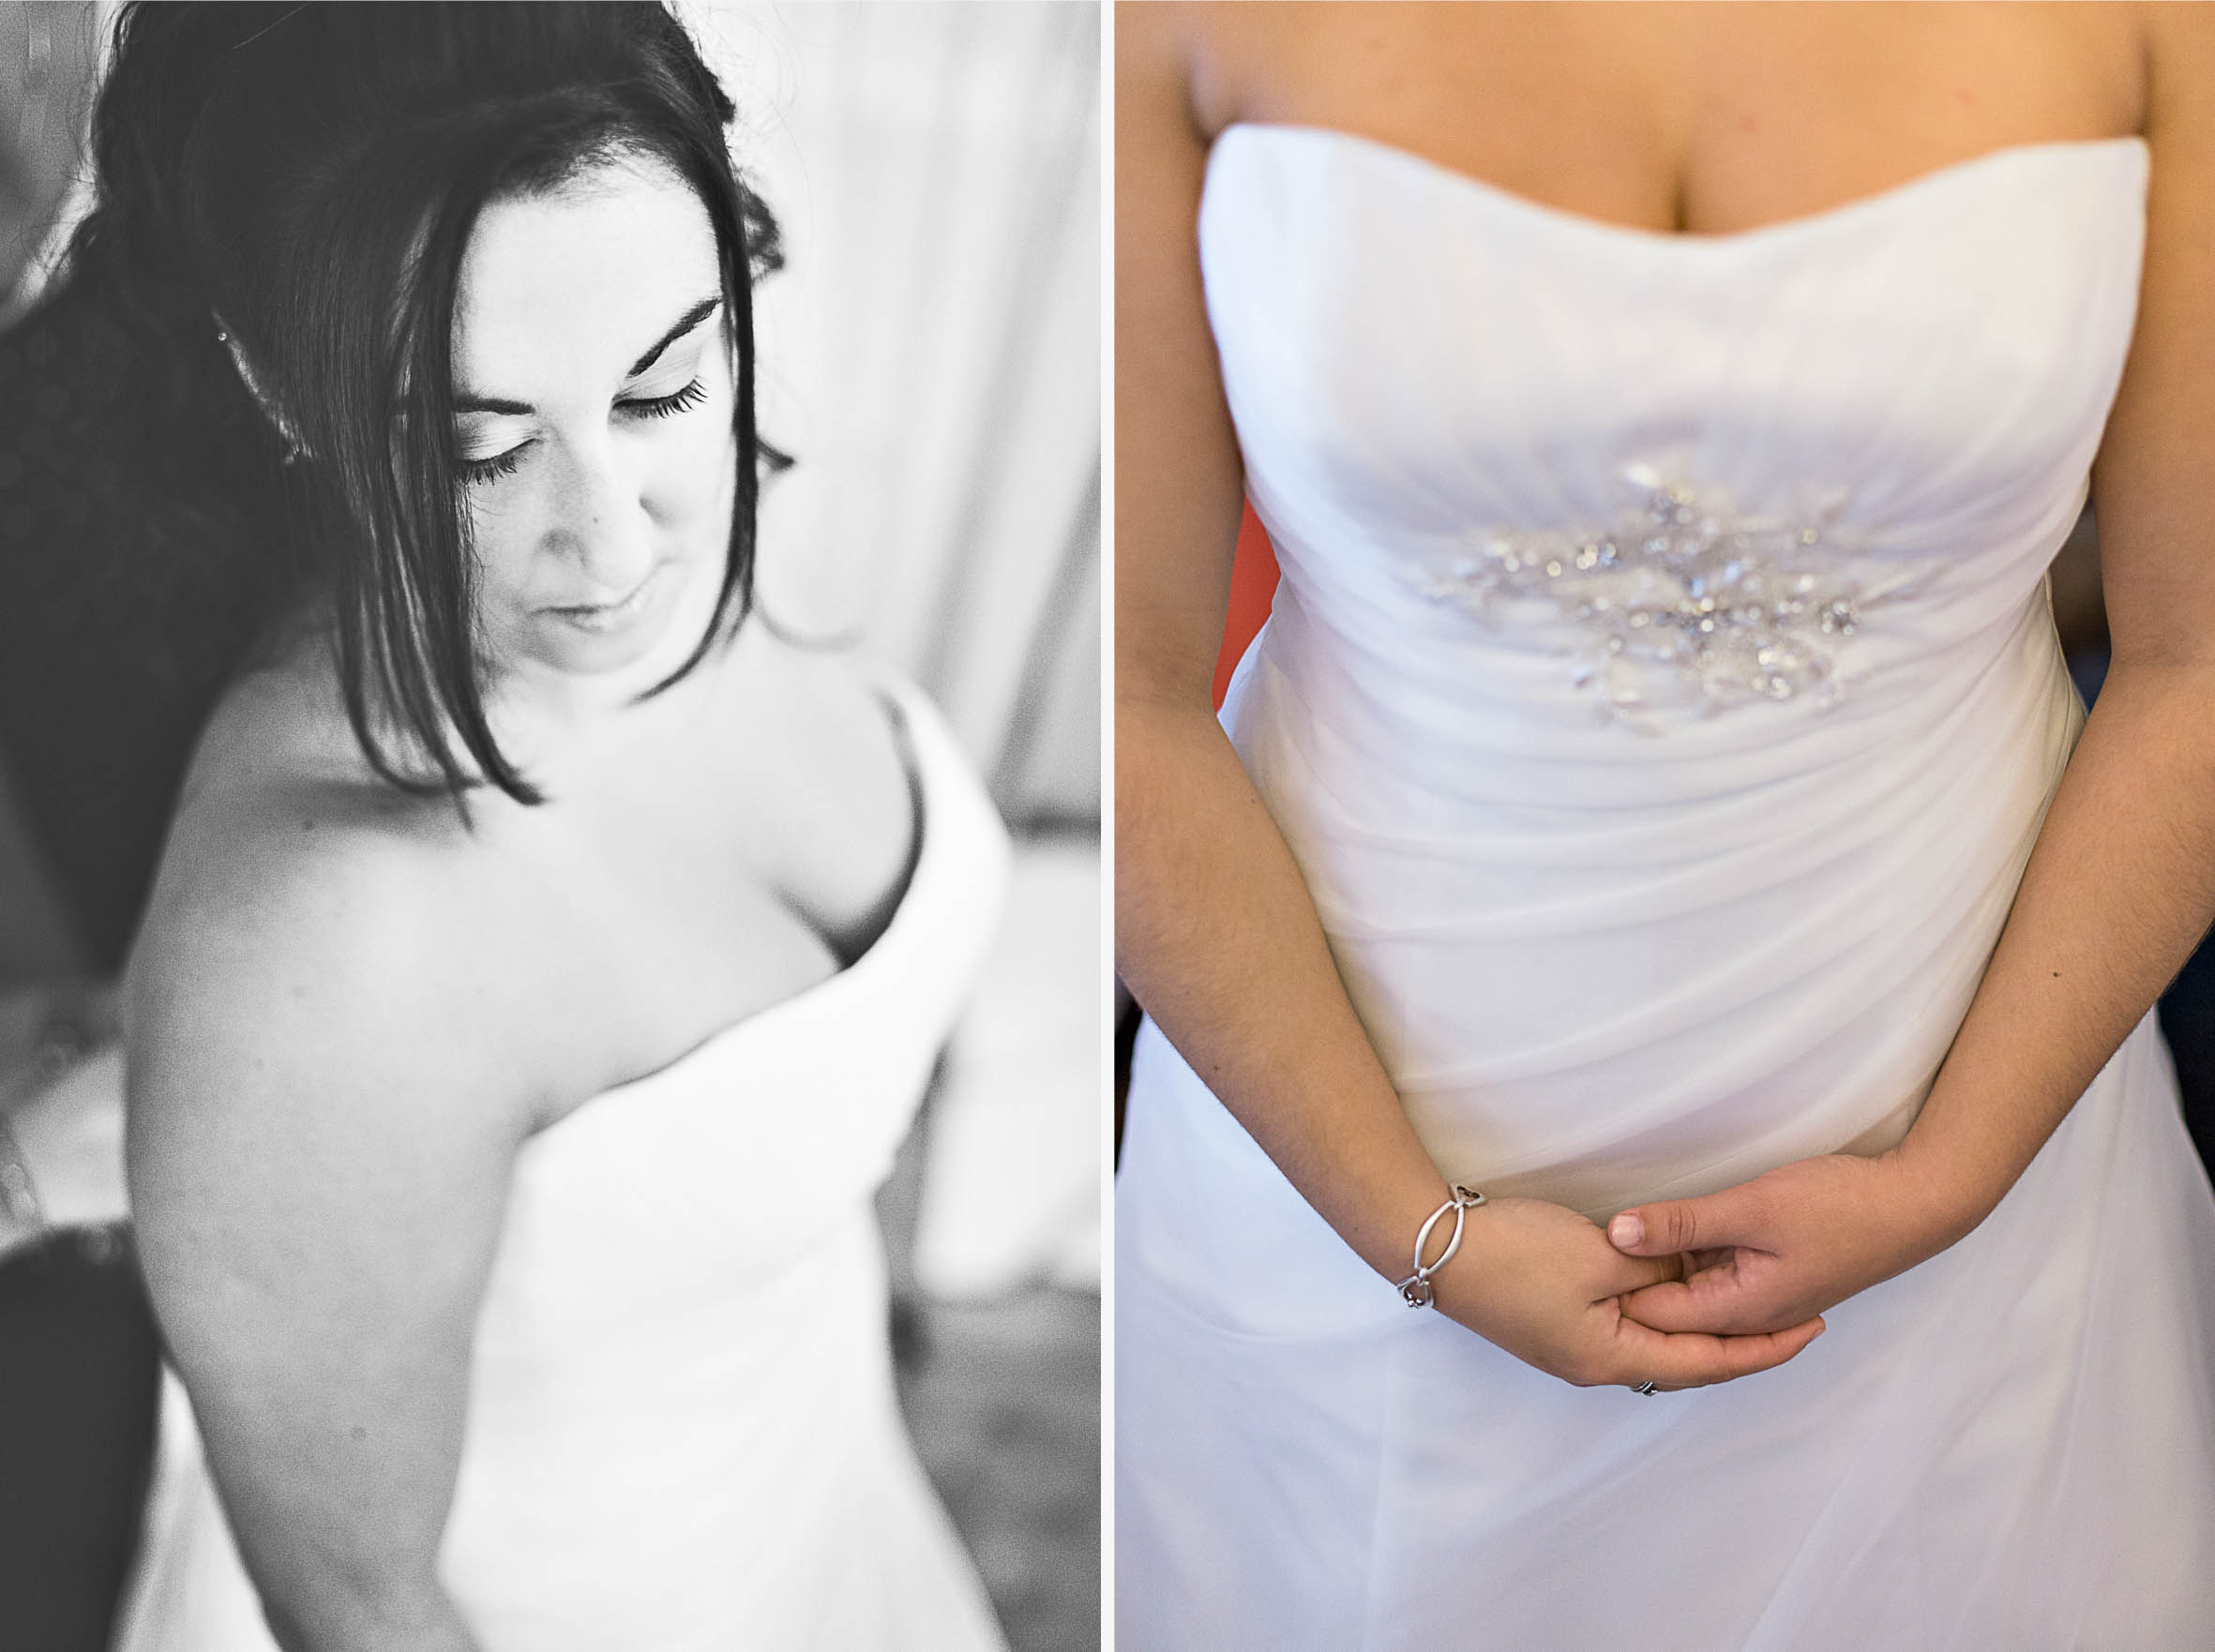 Photographe mariage avignon - Ambre & Amandine-7-1